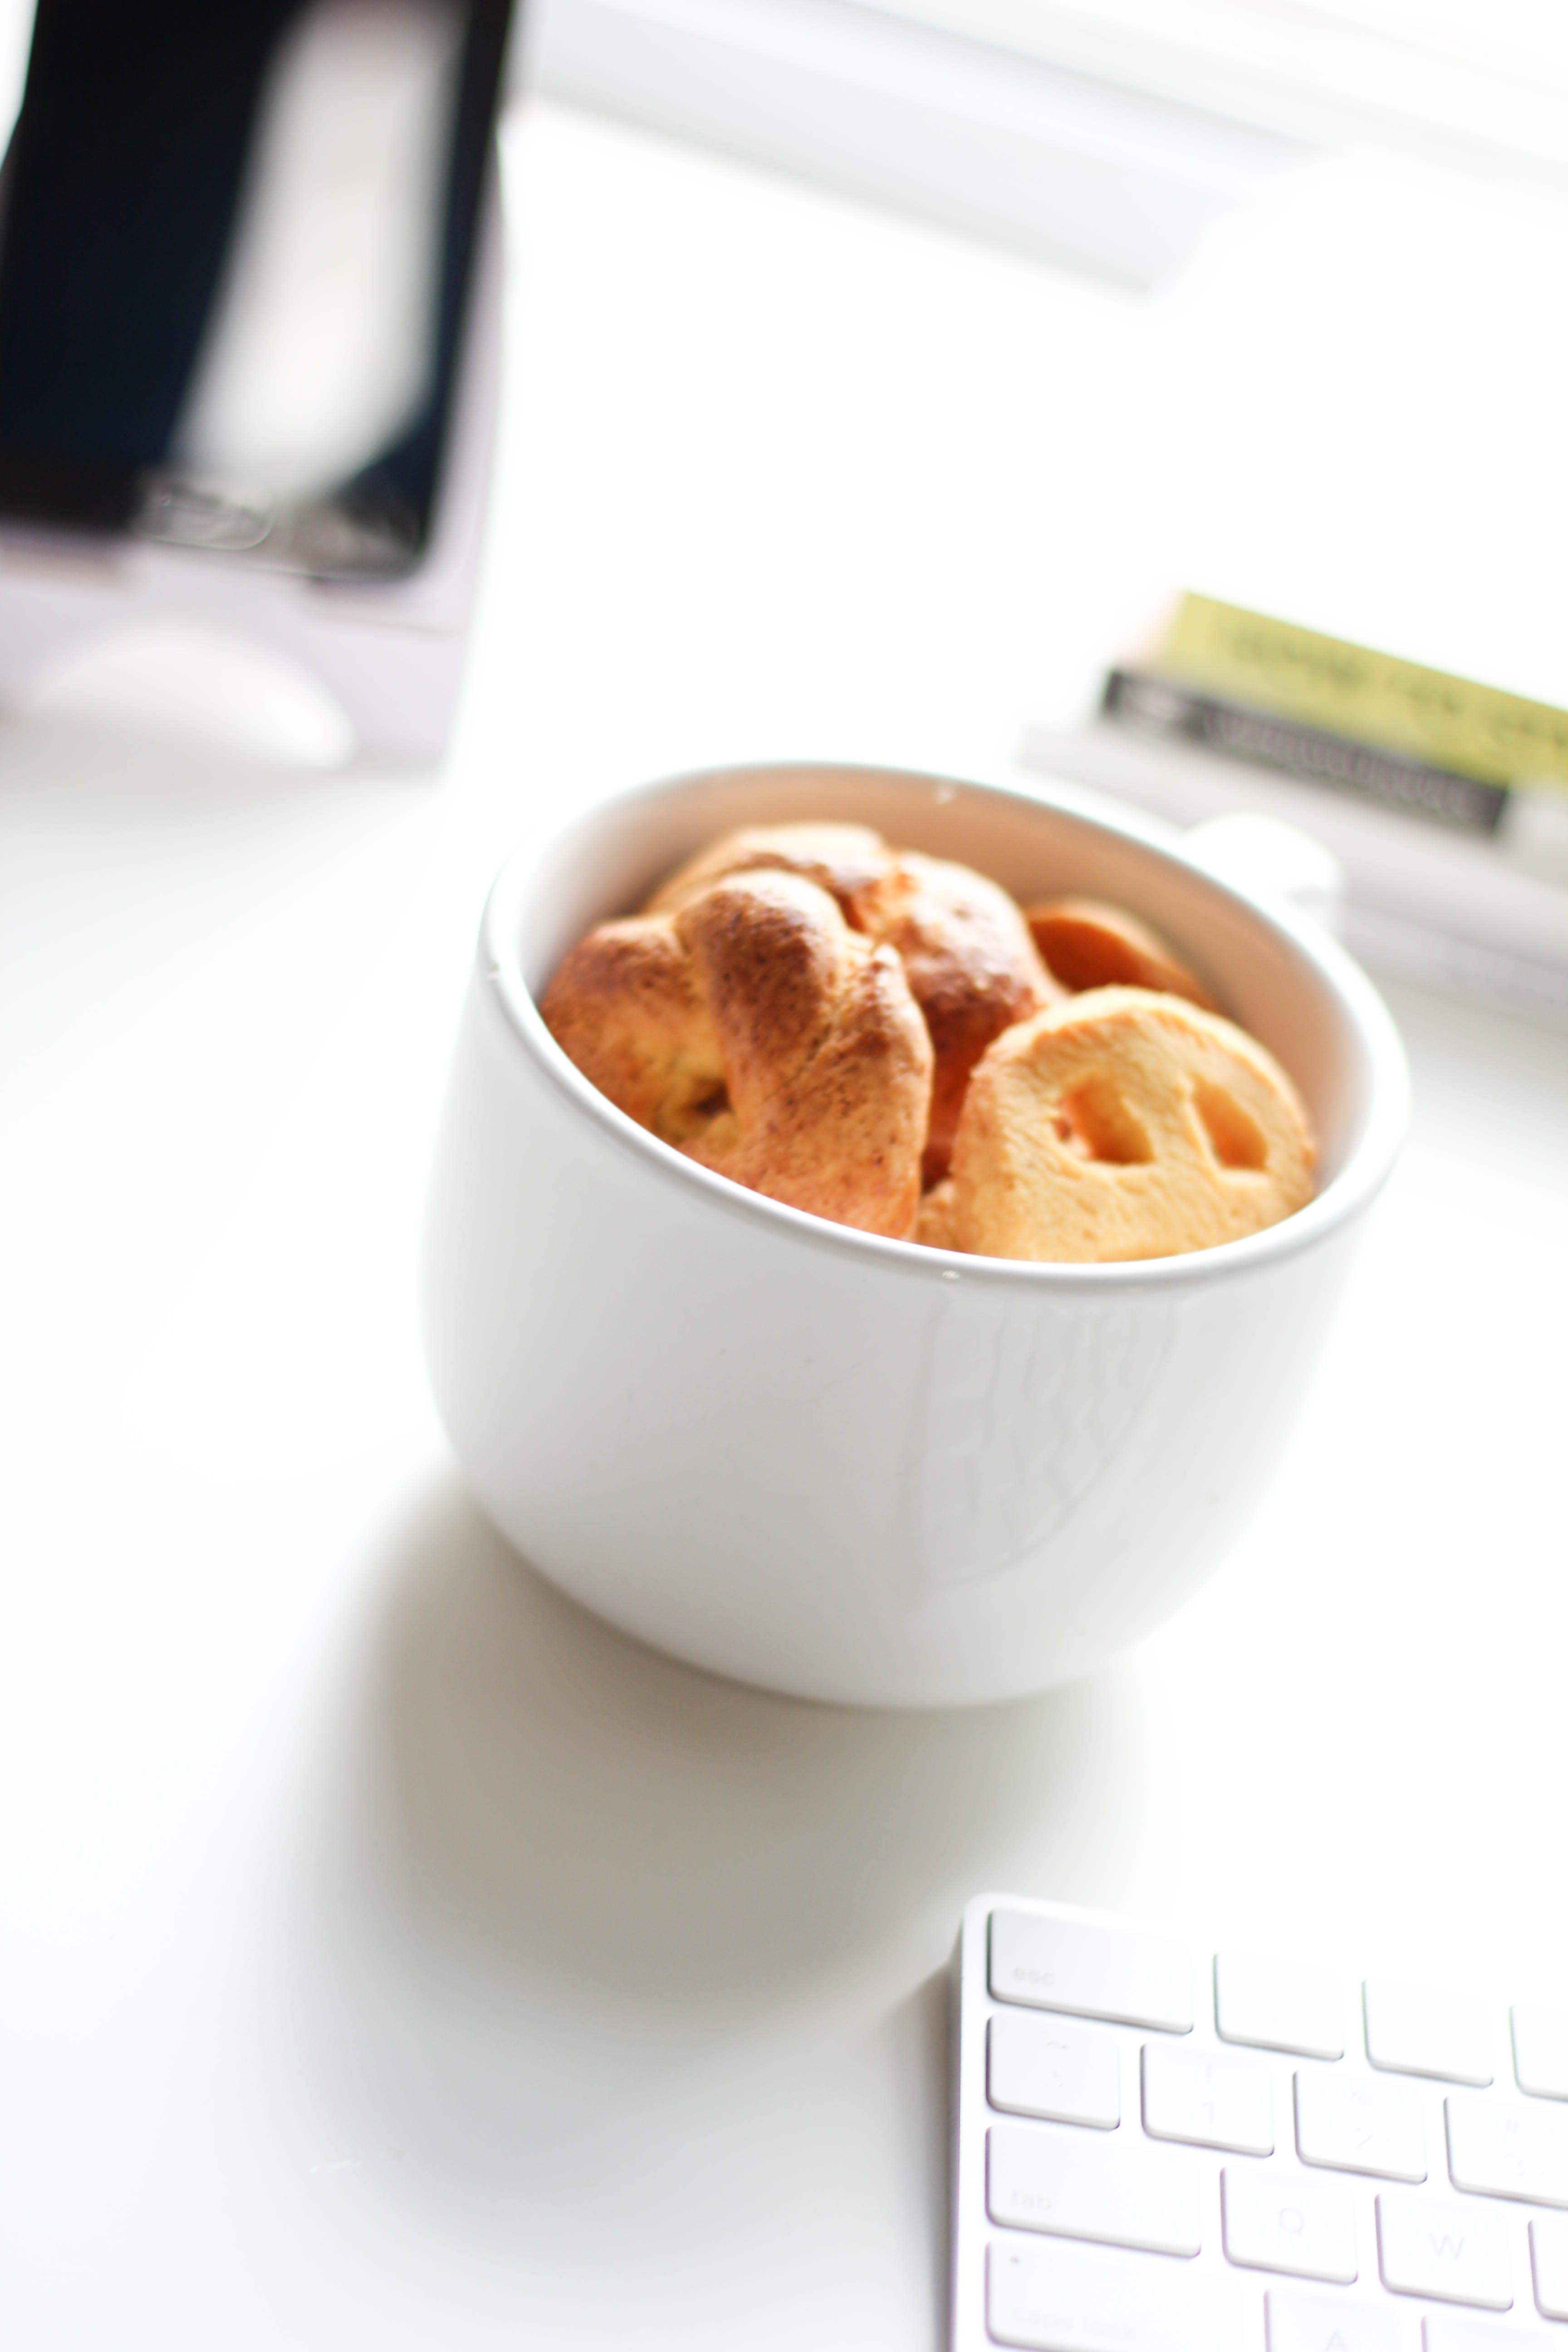 Free stock photo of bread, food, blur, breakfast